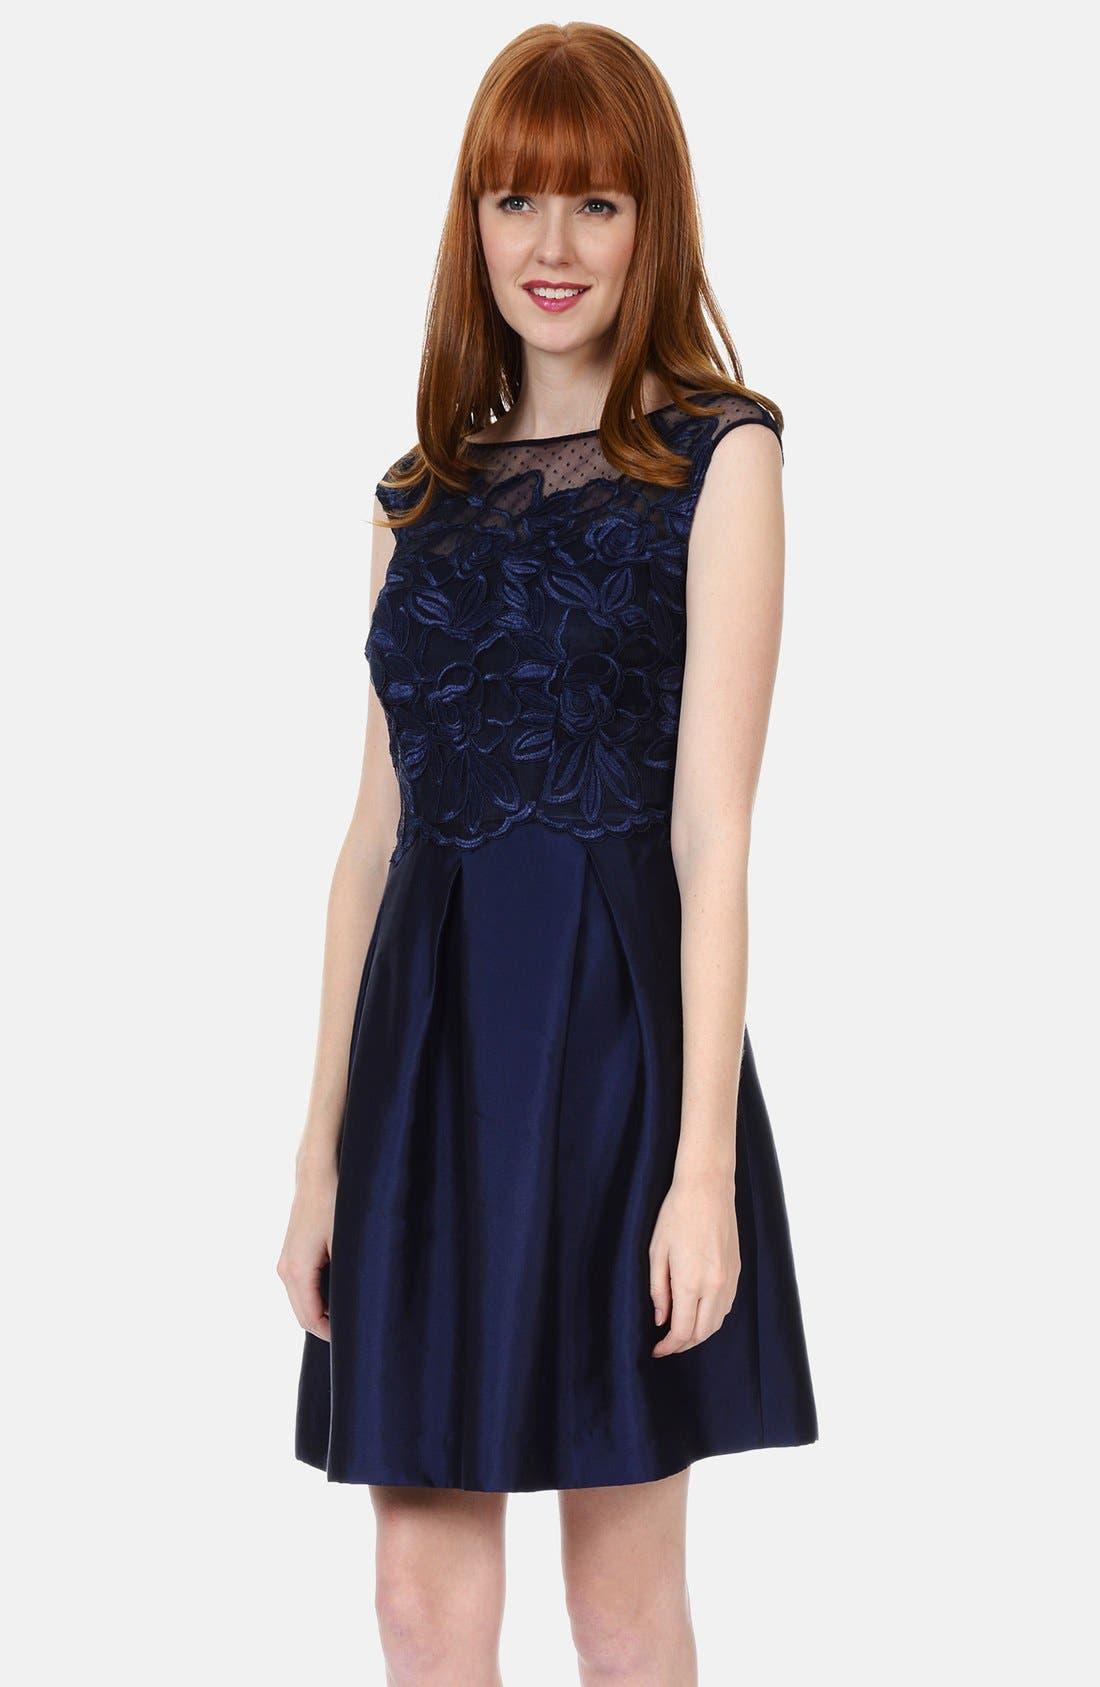 Alternate Image 1 Selected - Kay Unger Lace Bodice Dress